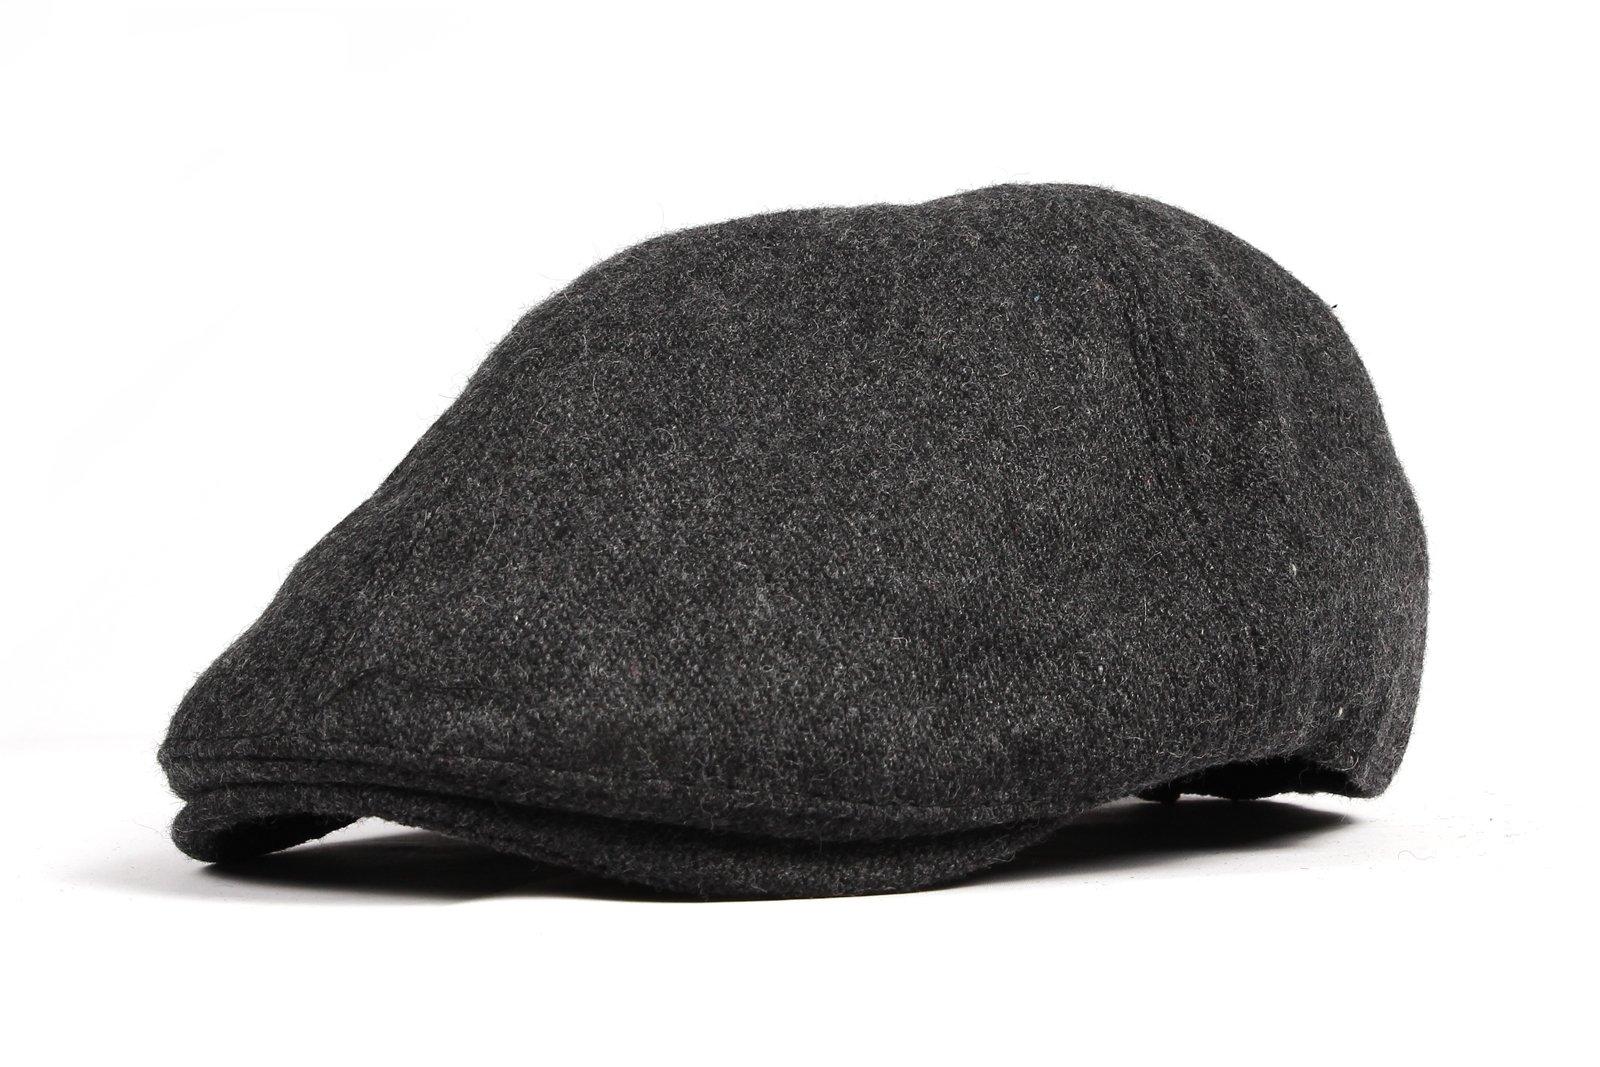 f482d15fb2a0f WITHMOONS Sombreros gorras Boinas Bombines Wool Newsboy Hat Flat Cap SL3021  product image